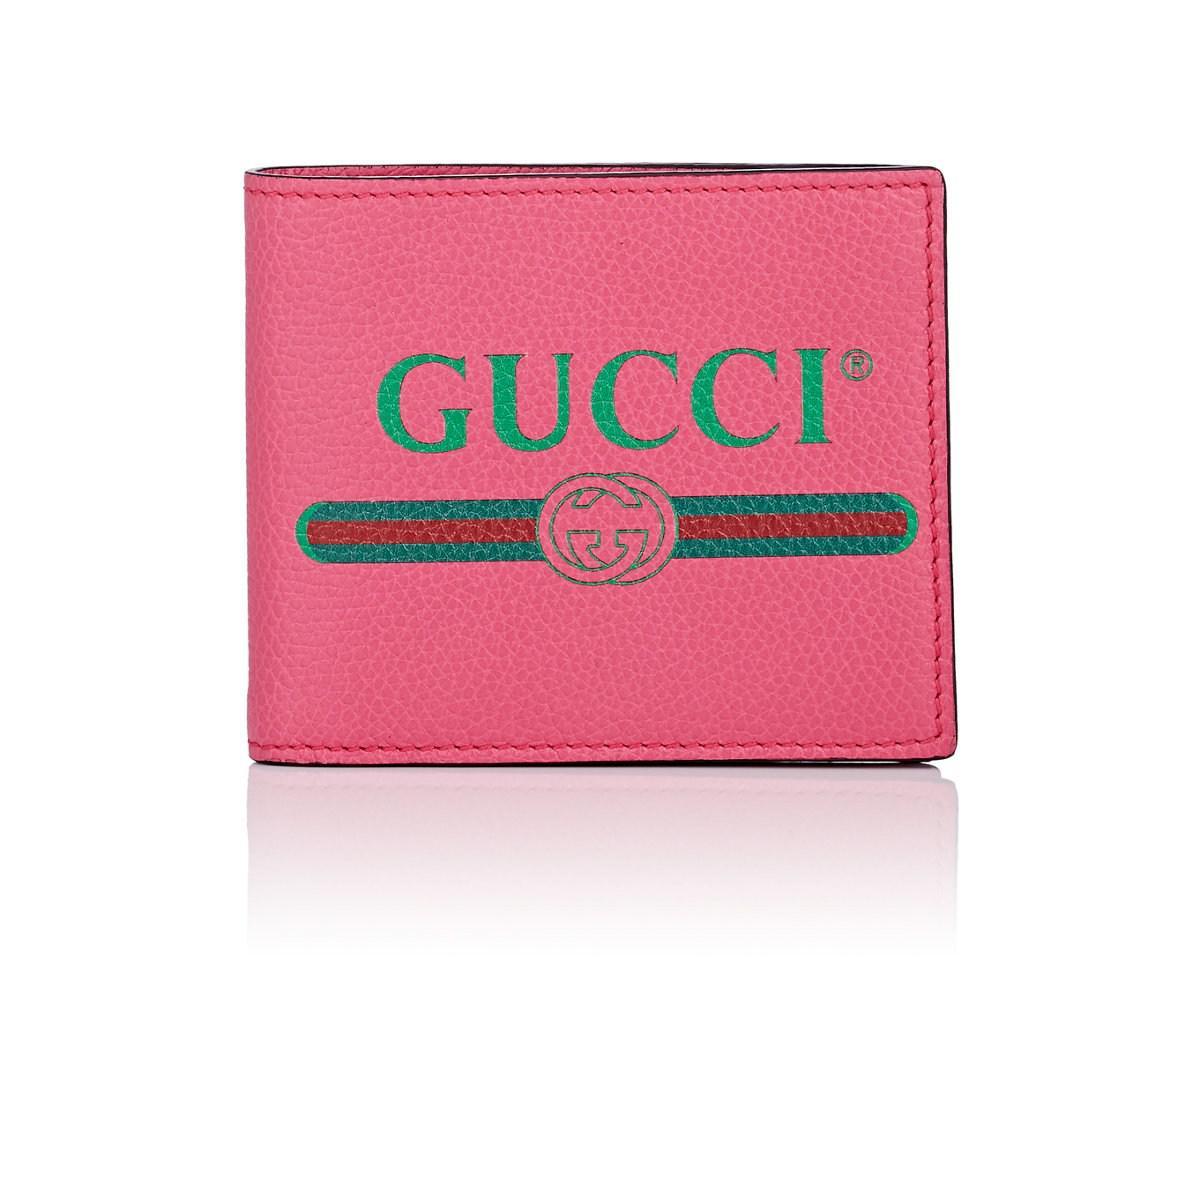 b7ebb5ca6dc Gucci - Pink Logo Leather Billfold for Men - Lyst. View fullscreen